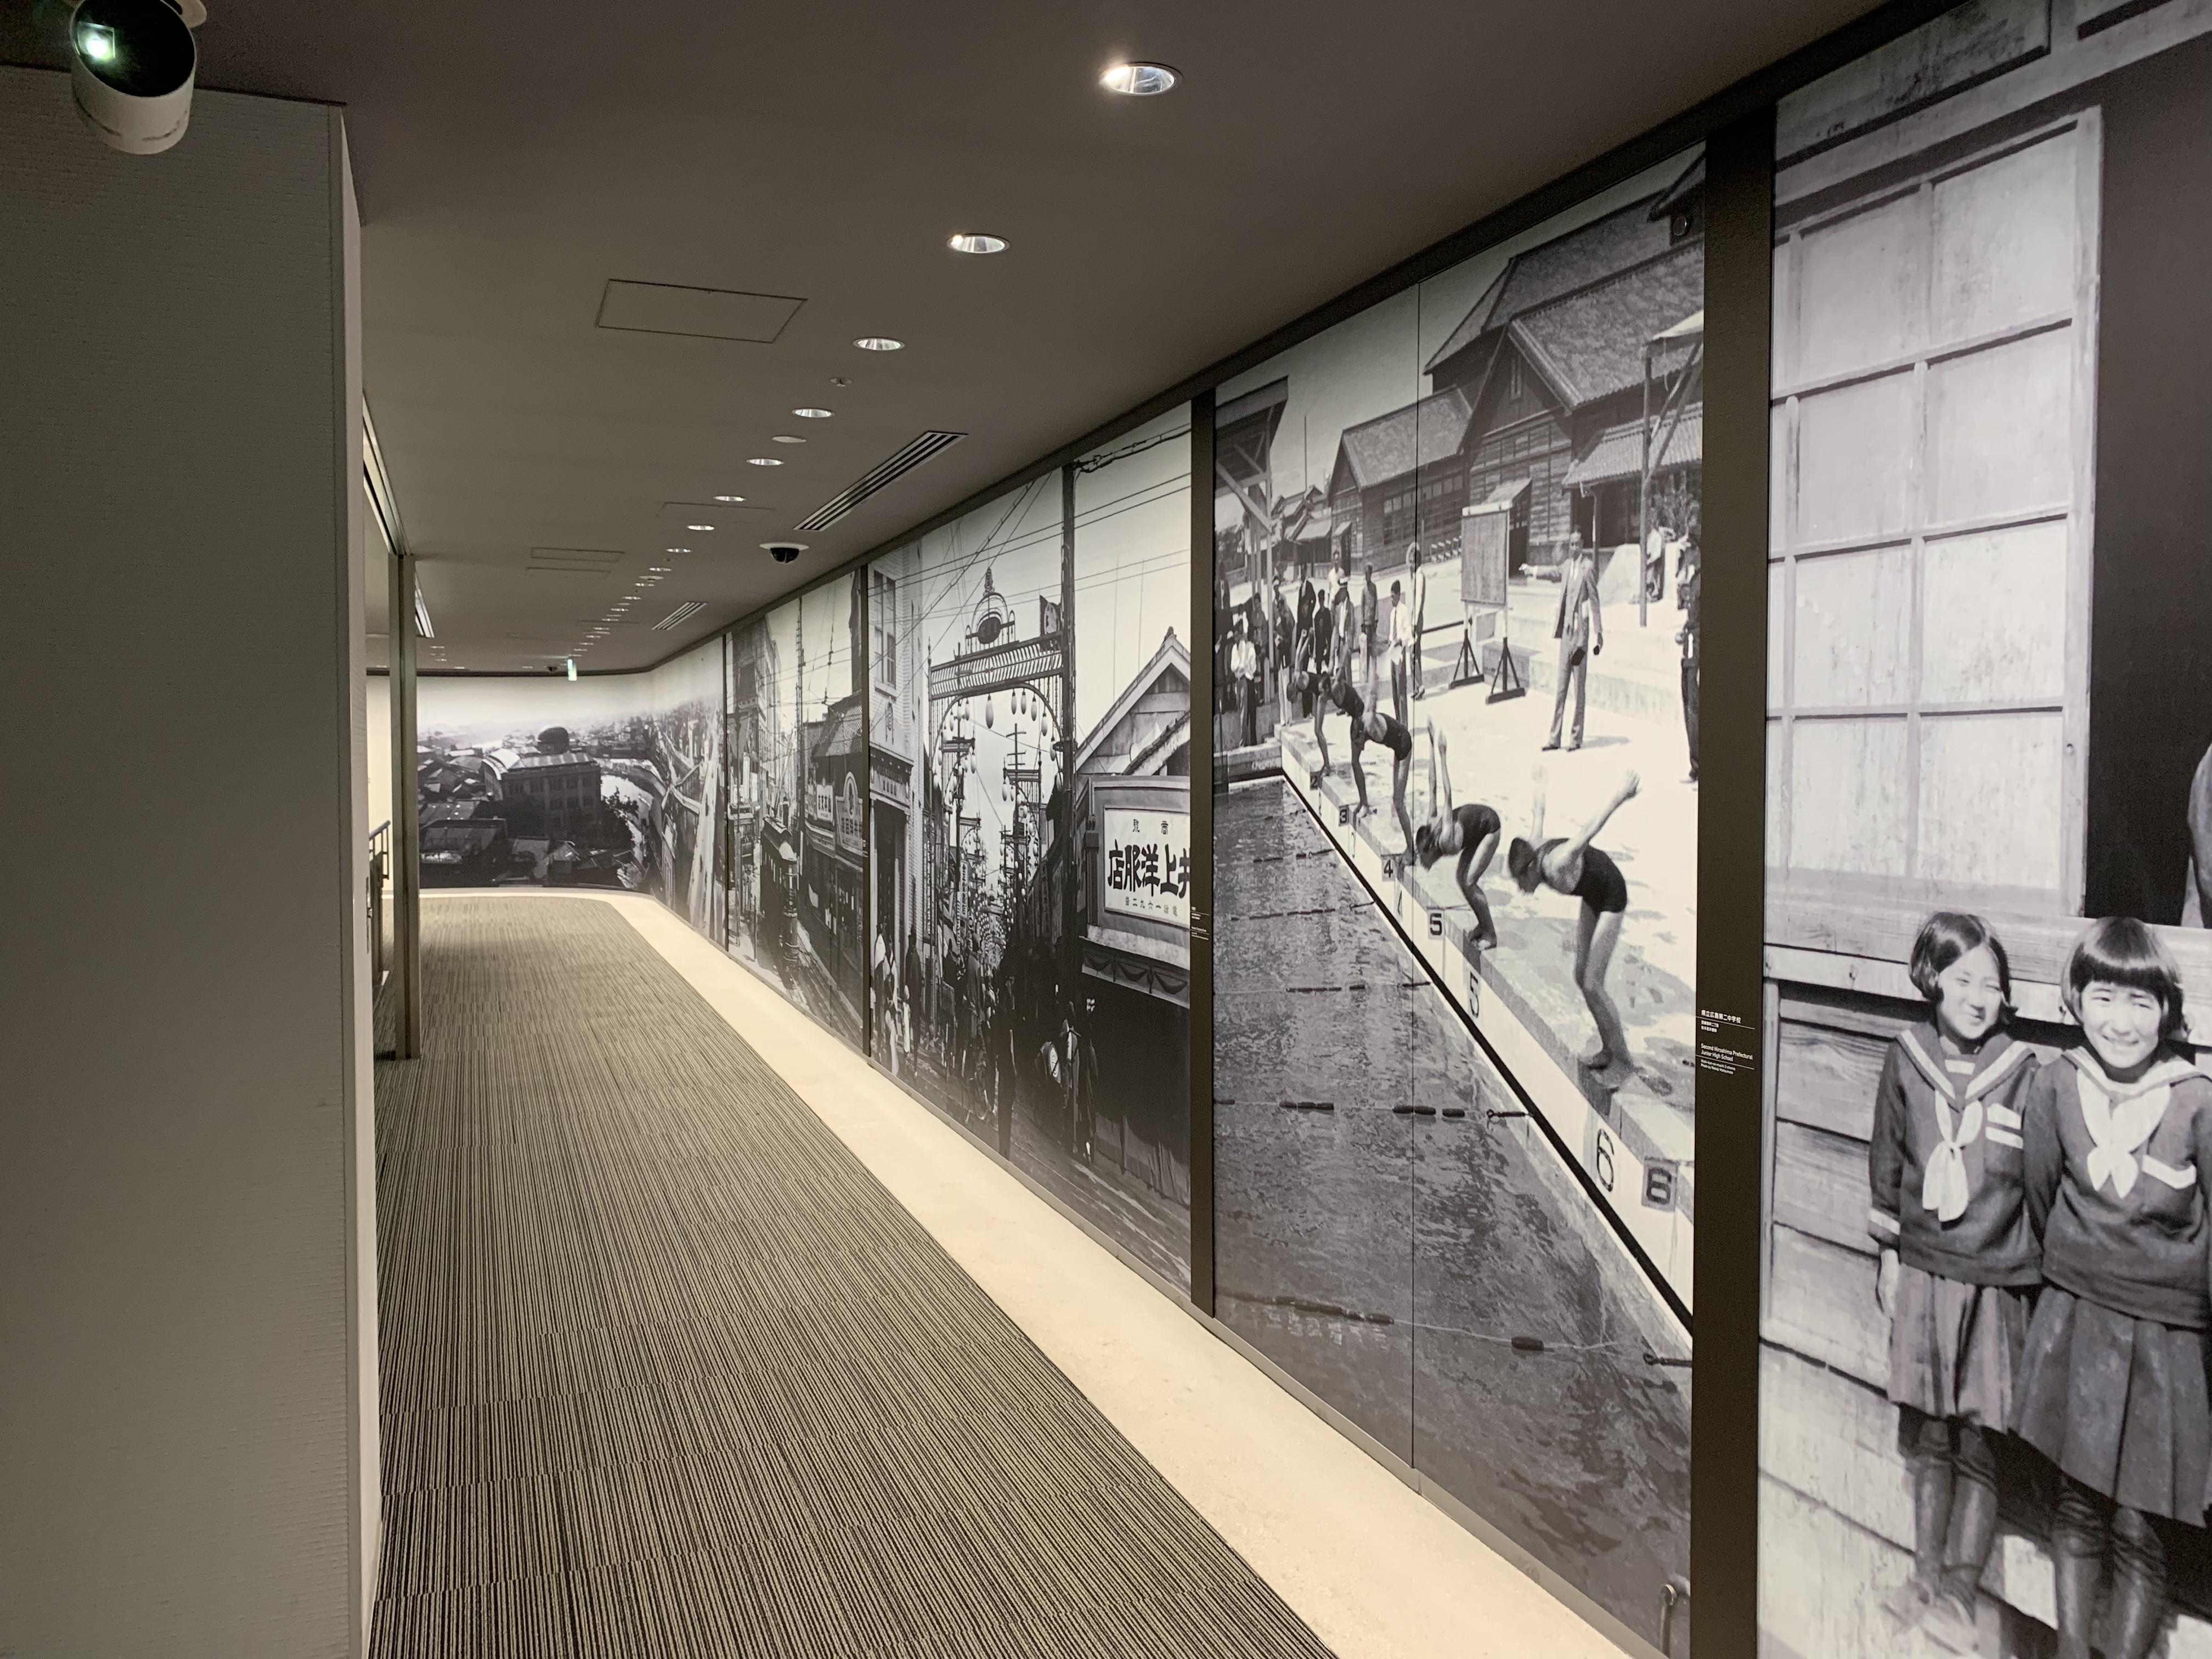 Hallway entryway to the Hiroshima Peace Memorial Museum